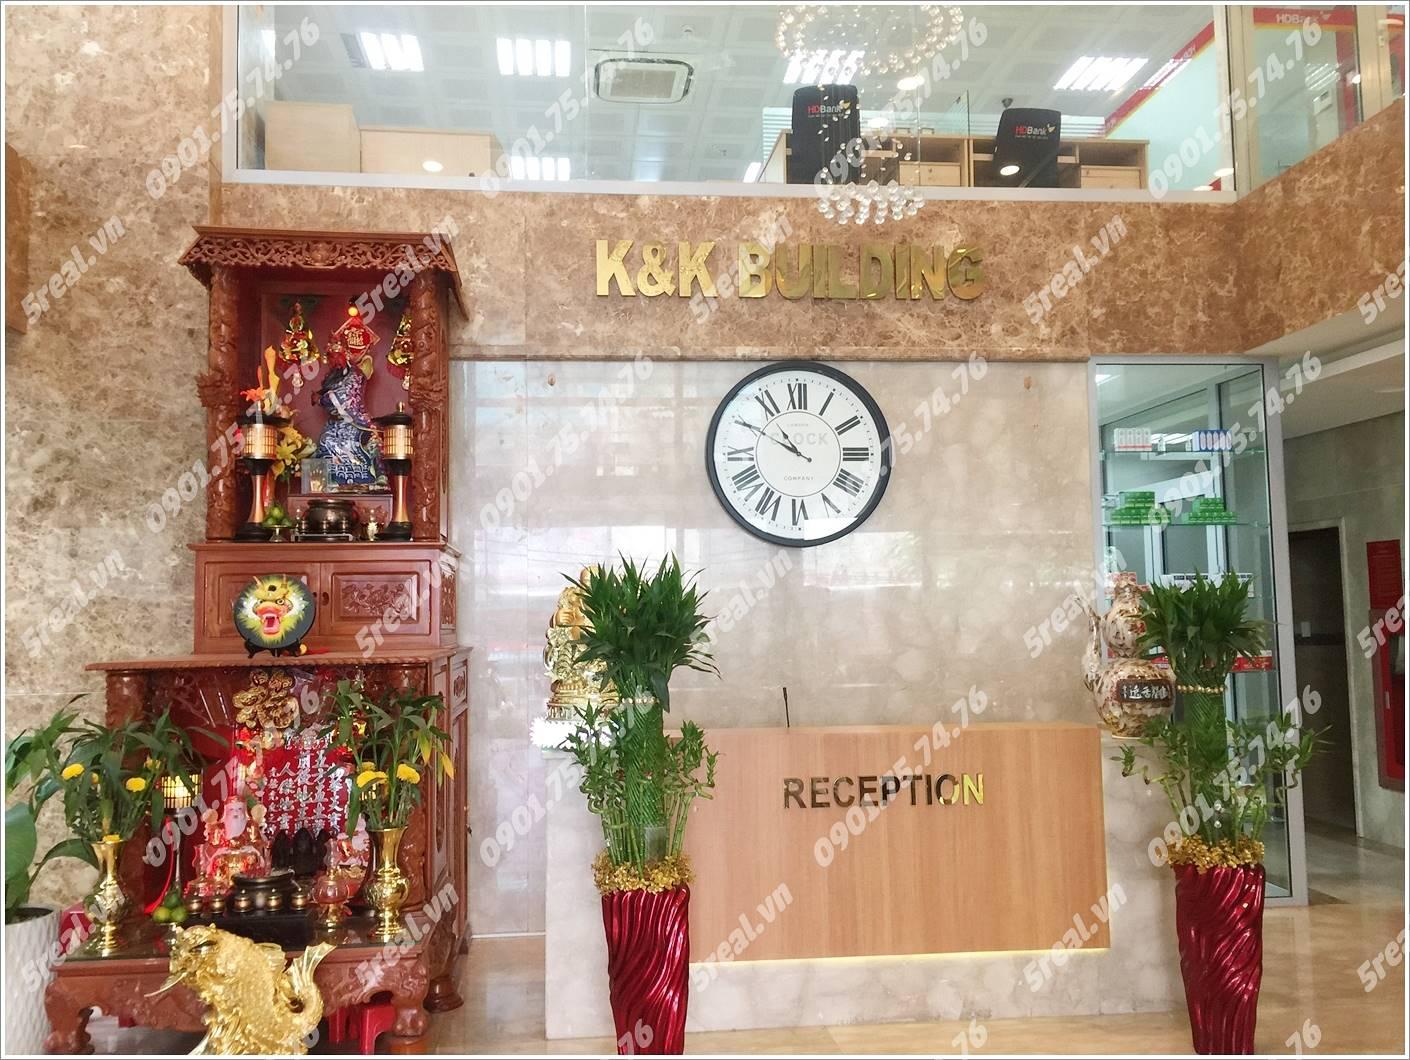 kk-building-le-dai-hanh-quan-11-van-phong-cho-thue-tphcm-5real.vn-05